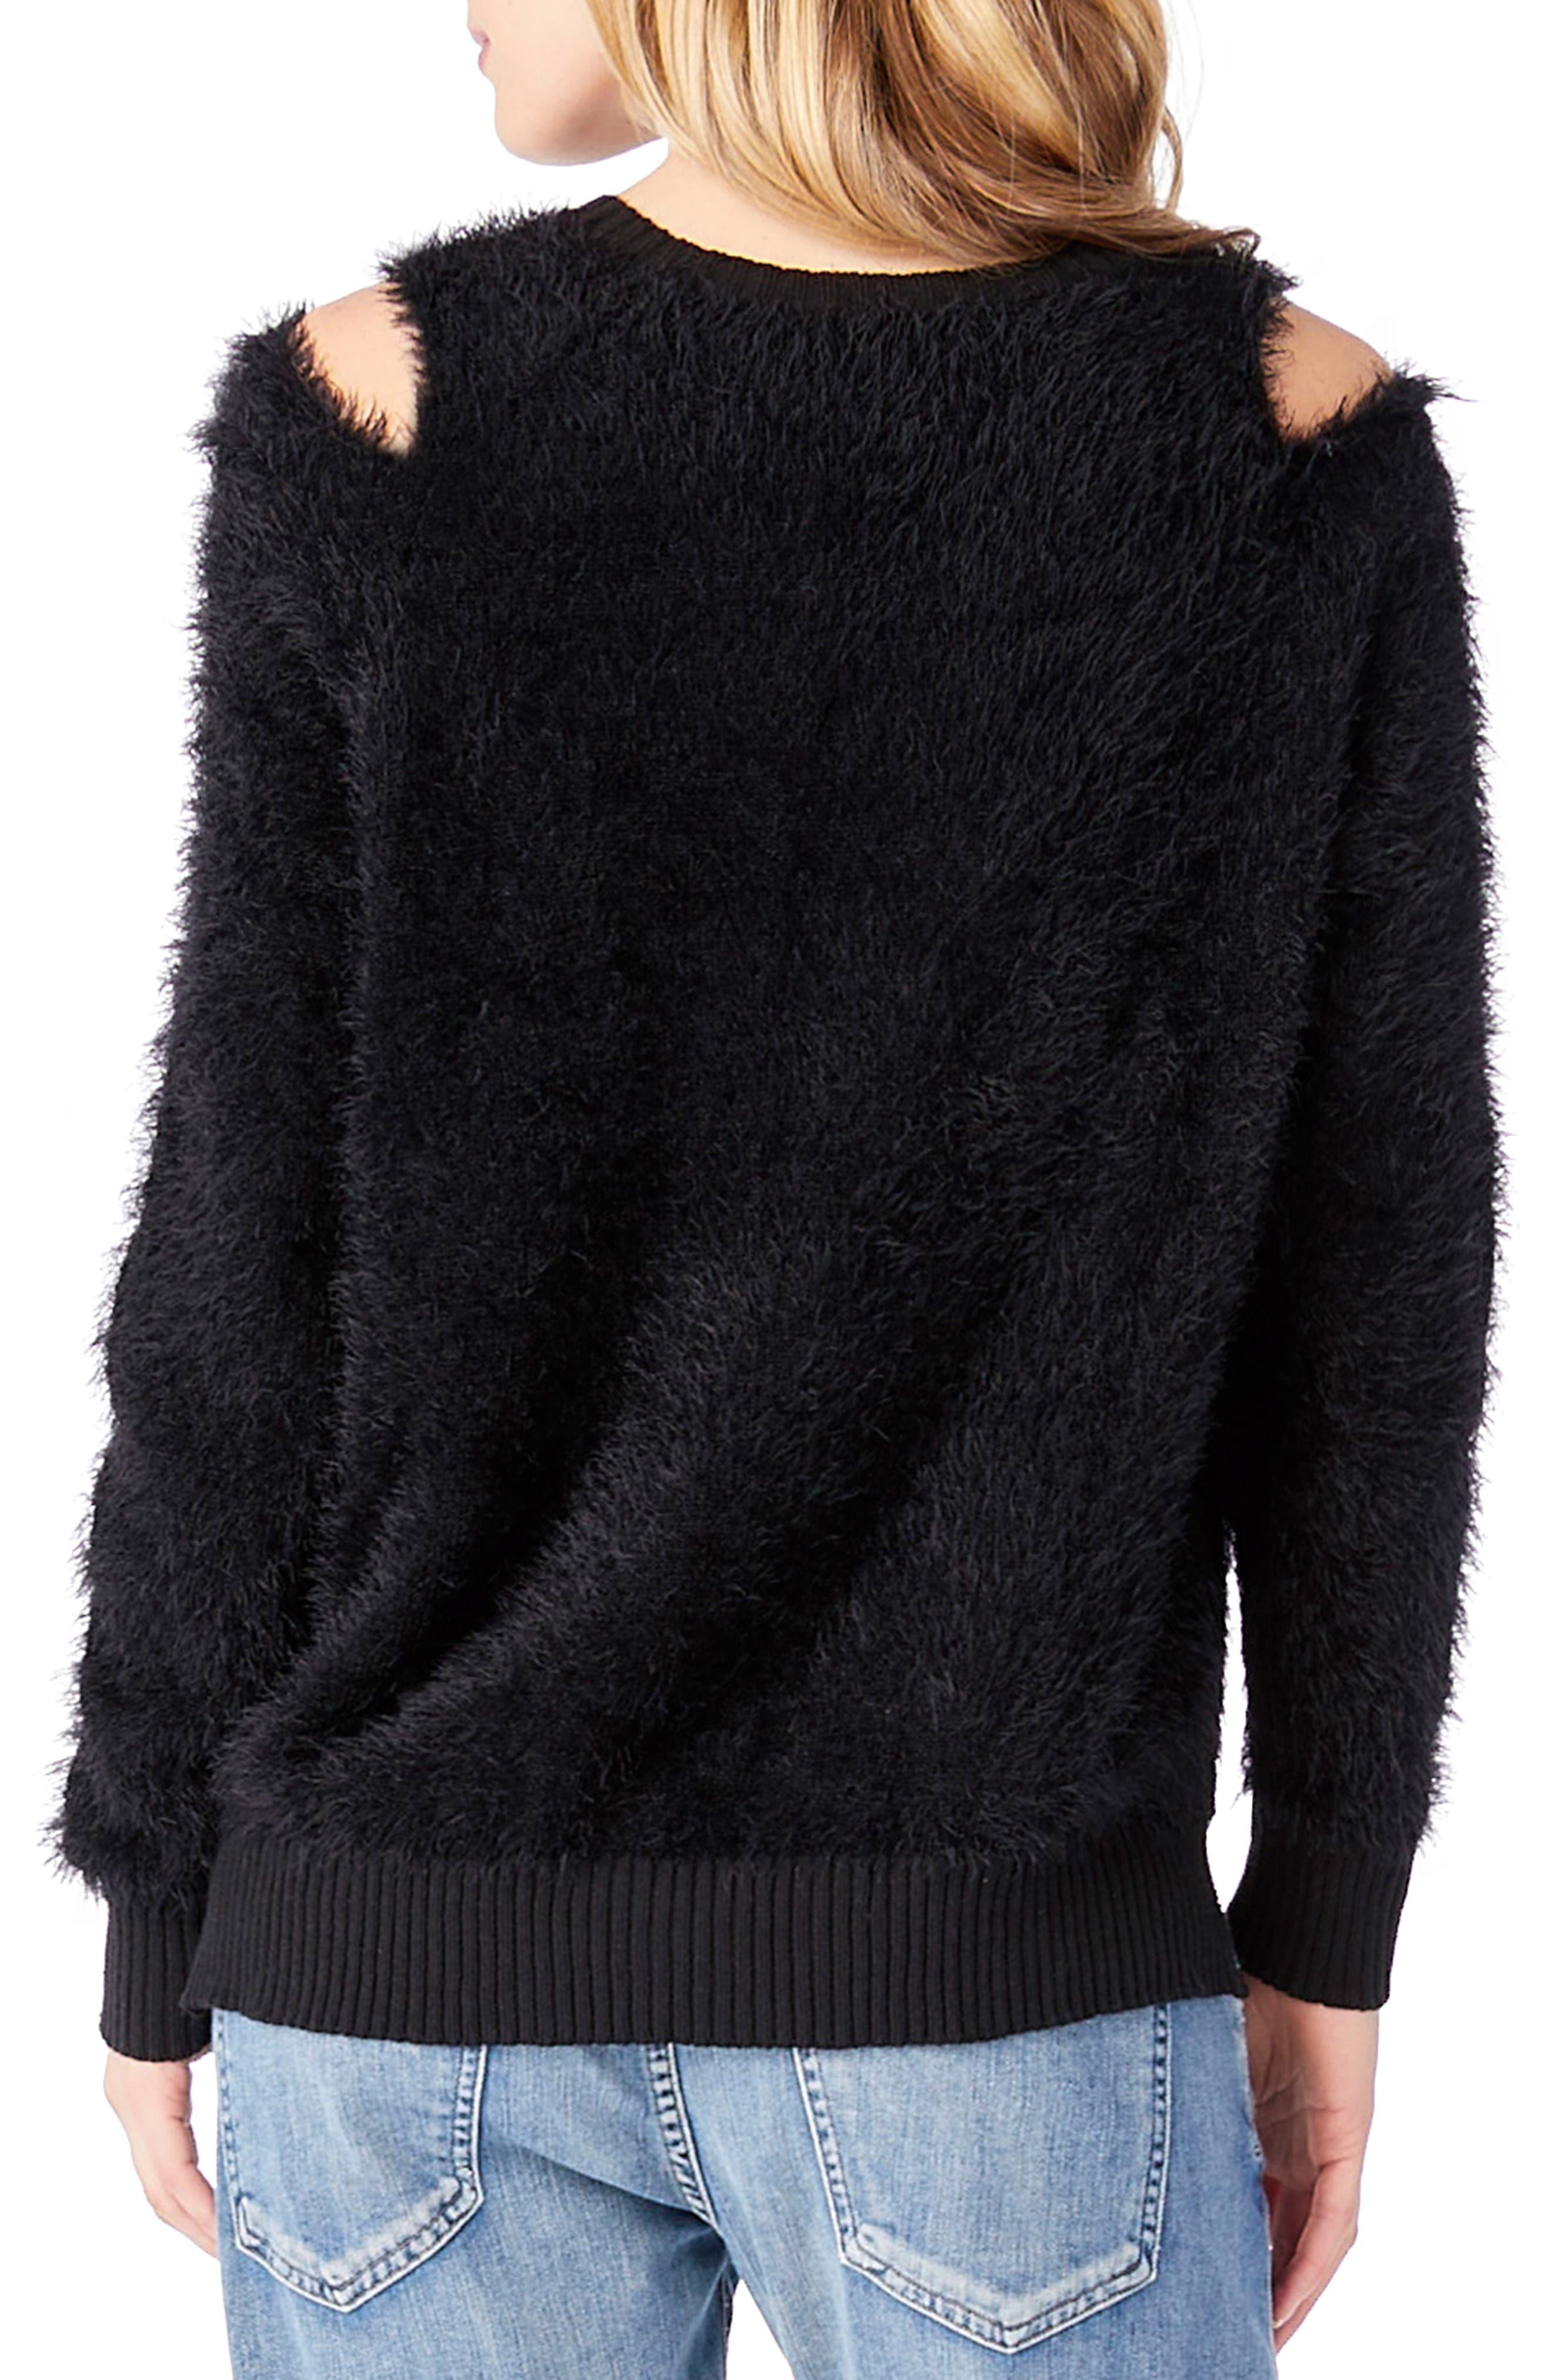 Eyelash Knit Sweater,                             Alternate thumbnail 2, color,                             001